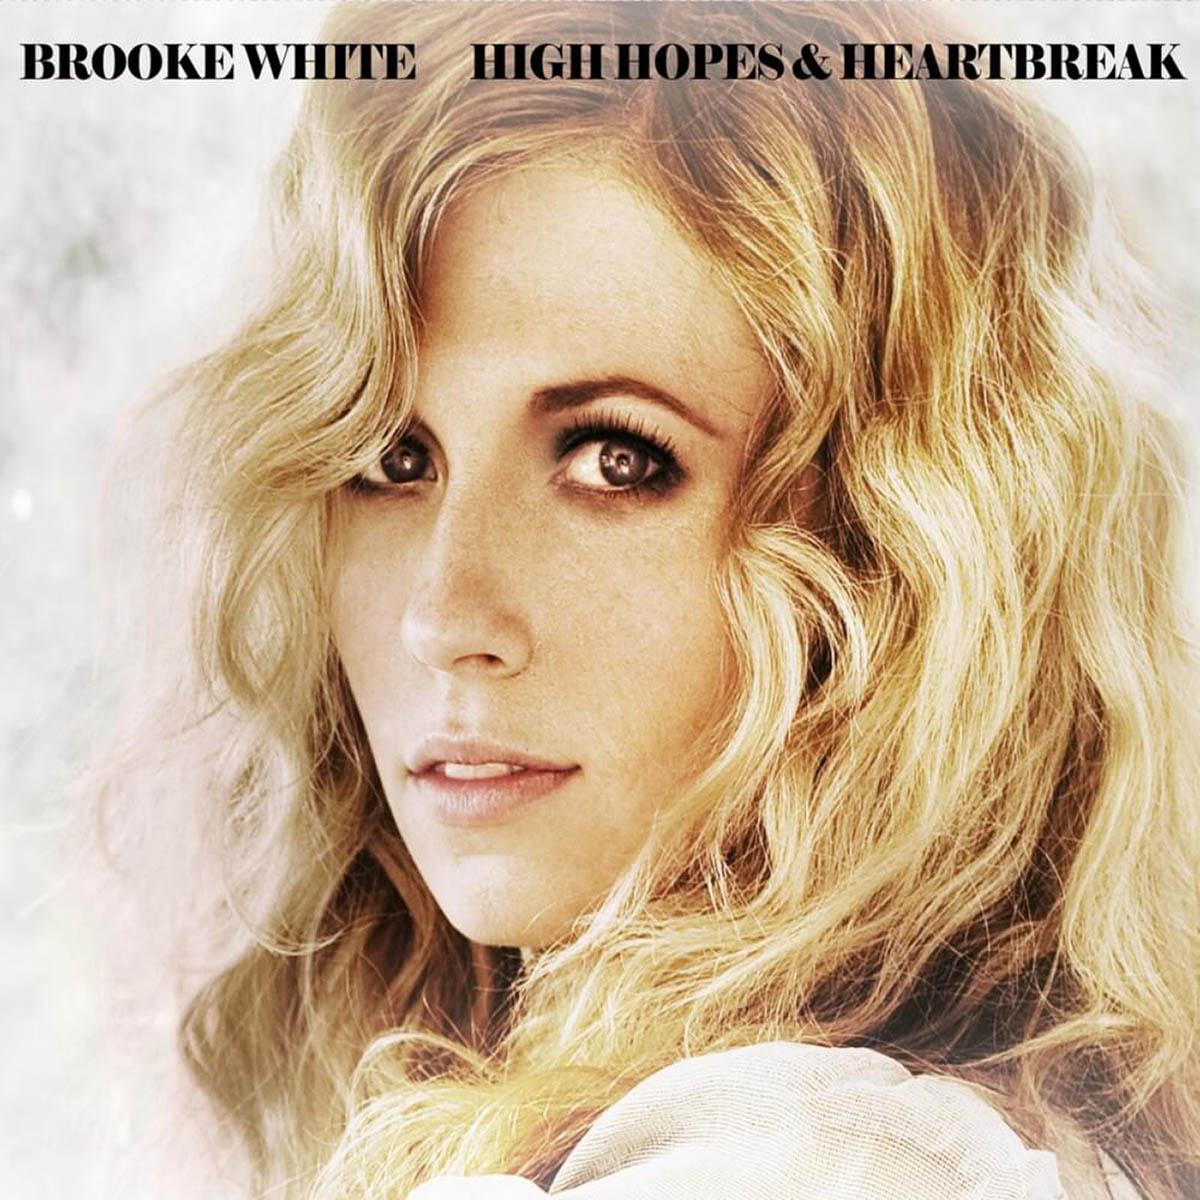 Brooke White, High Hopes & Heartbreak